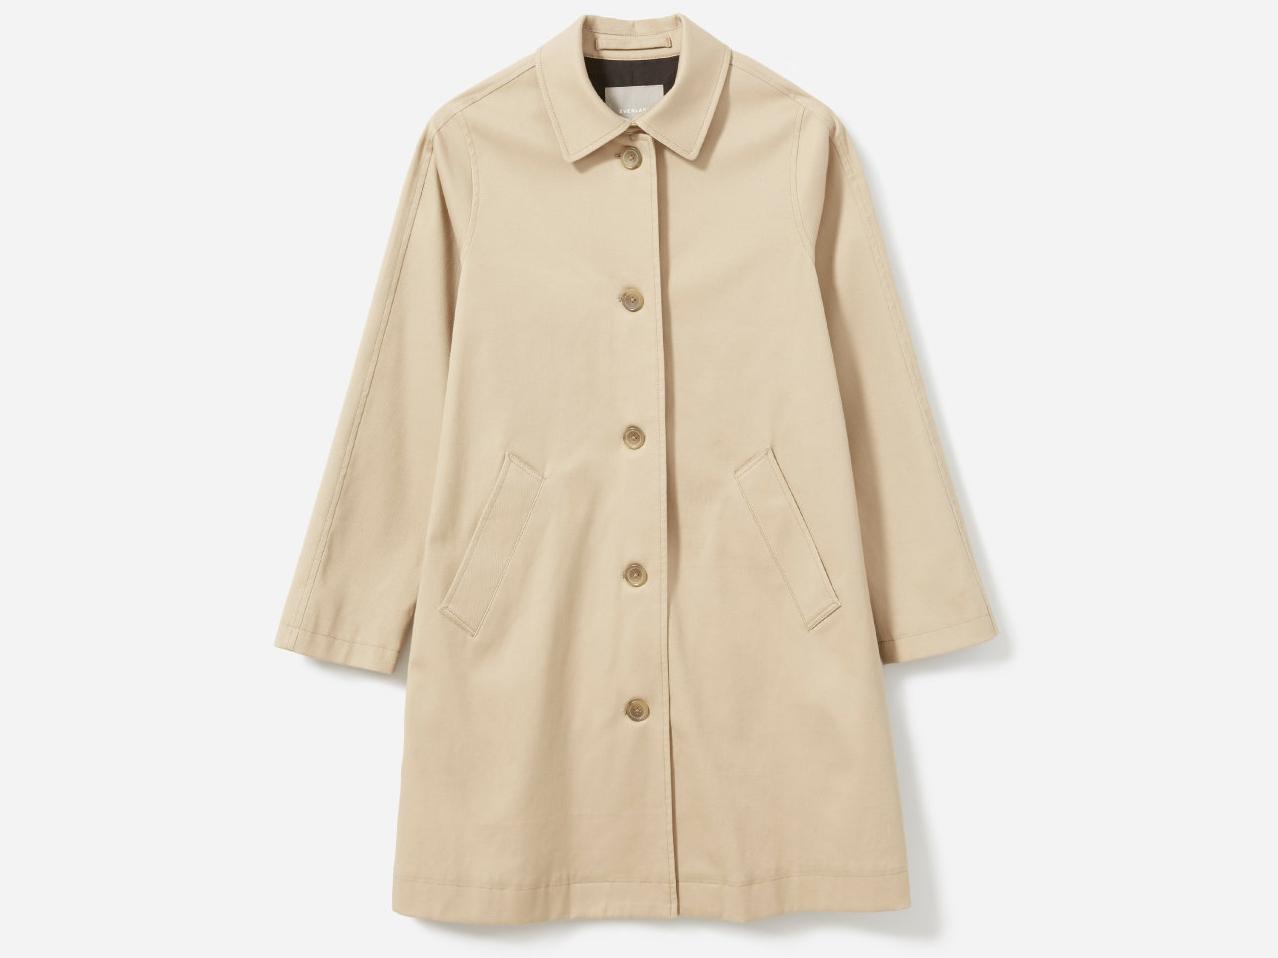 The Mac Coat Everlane